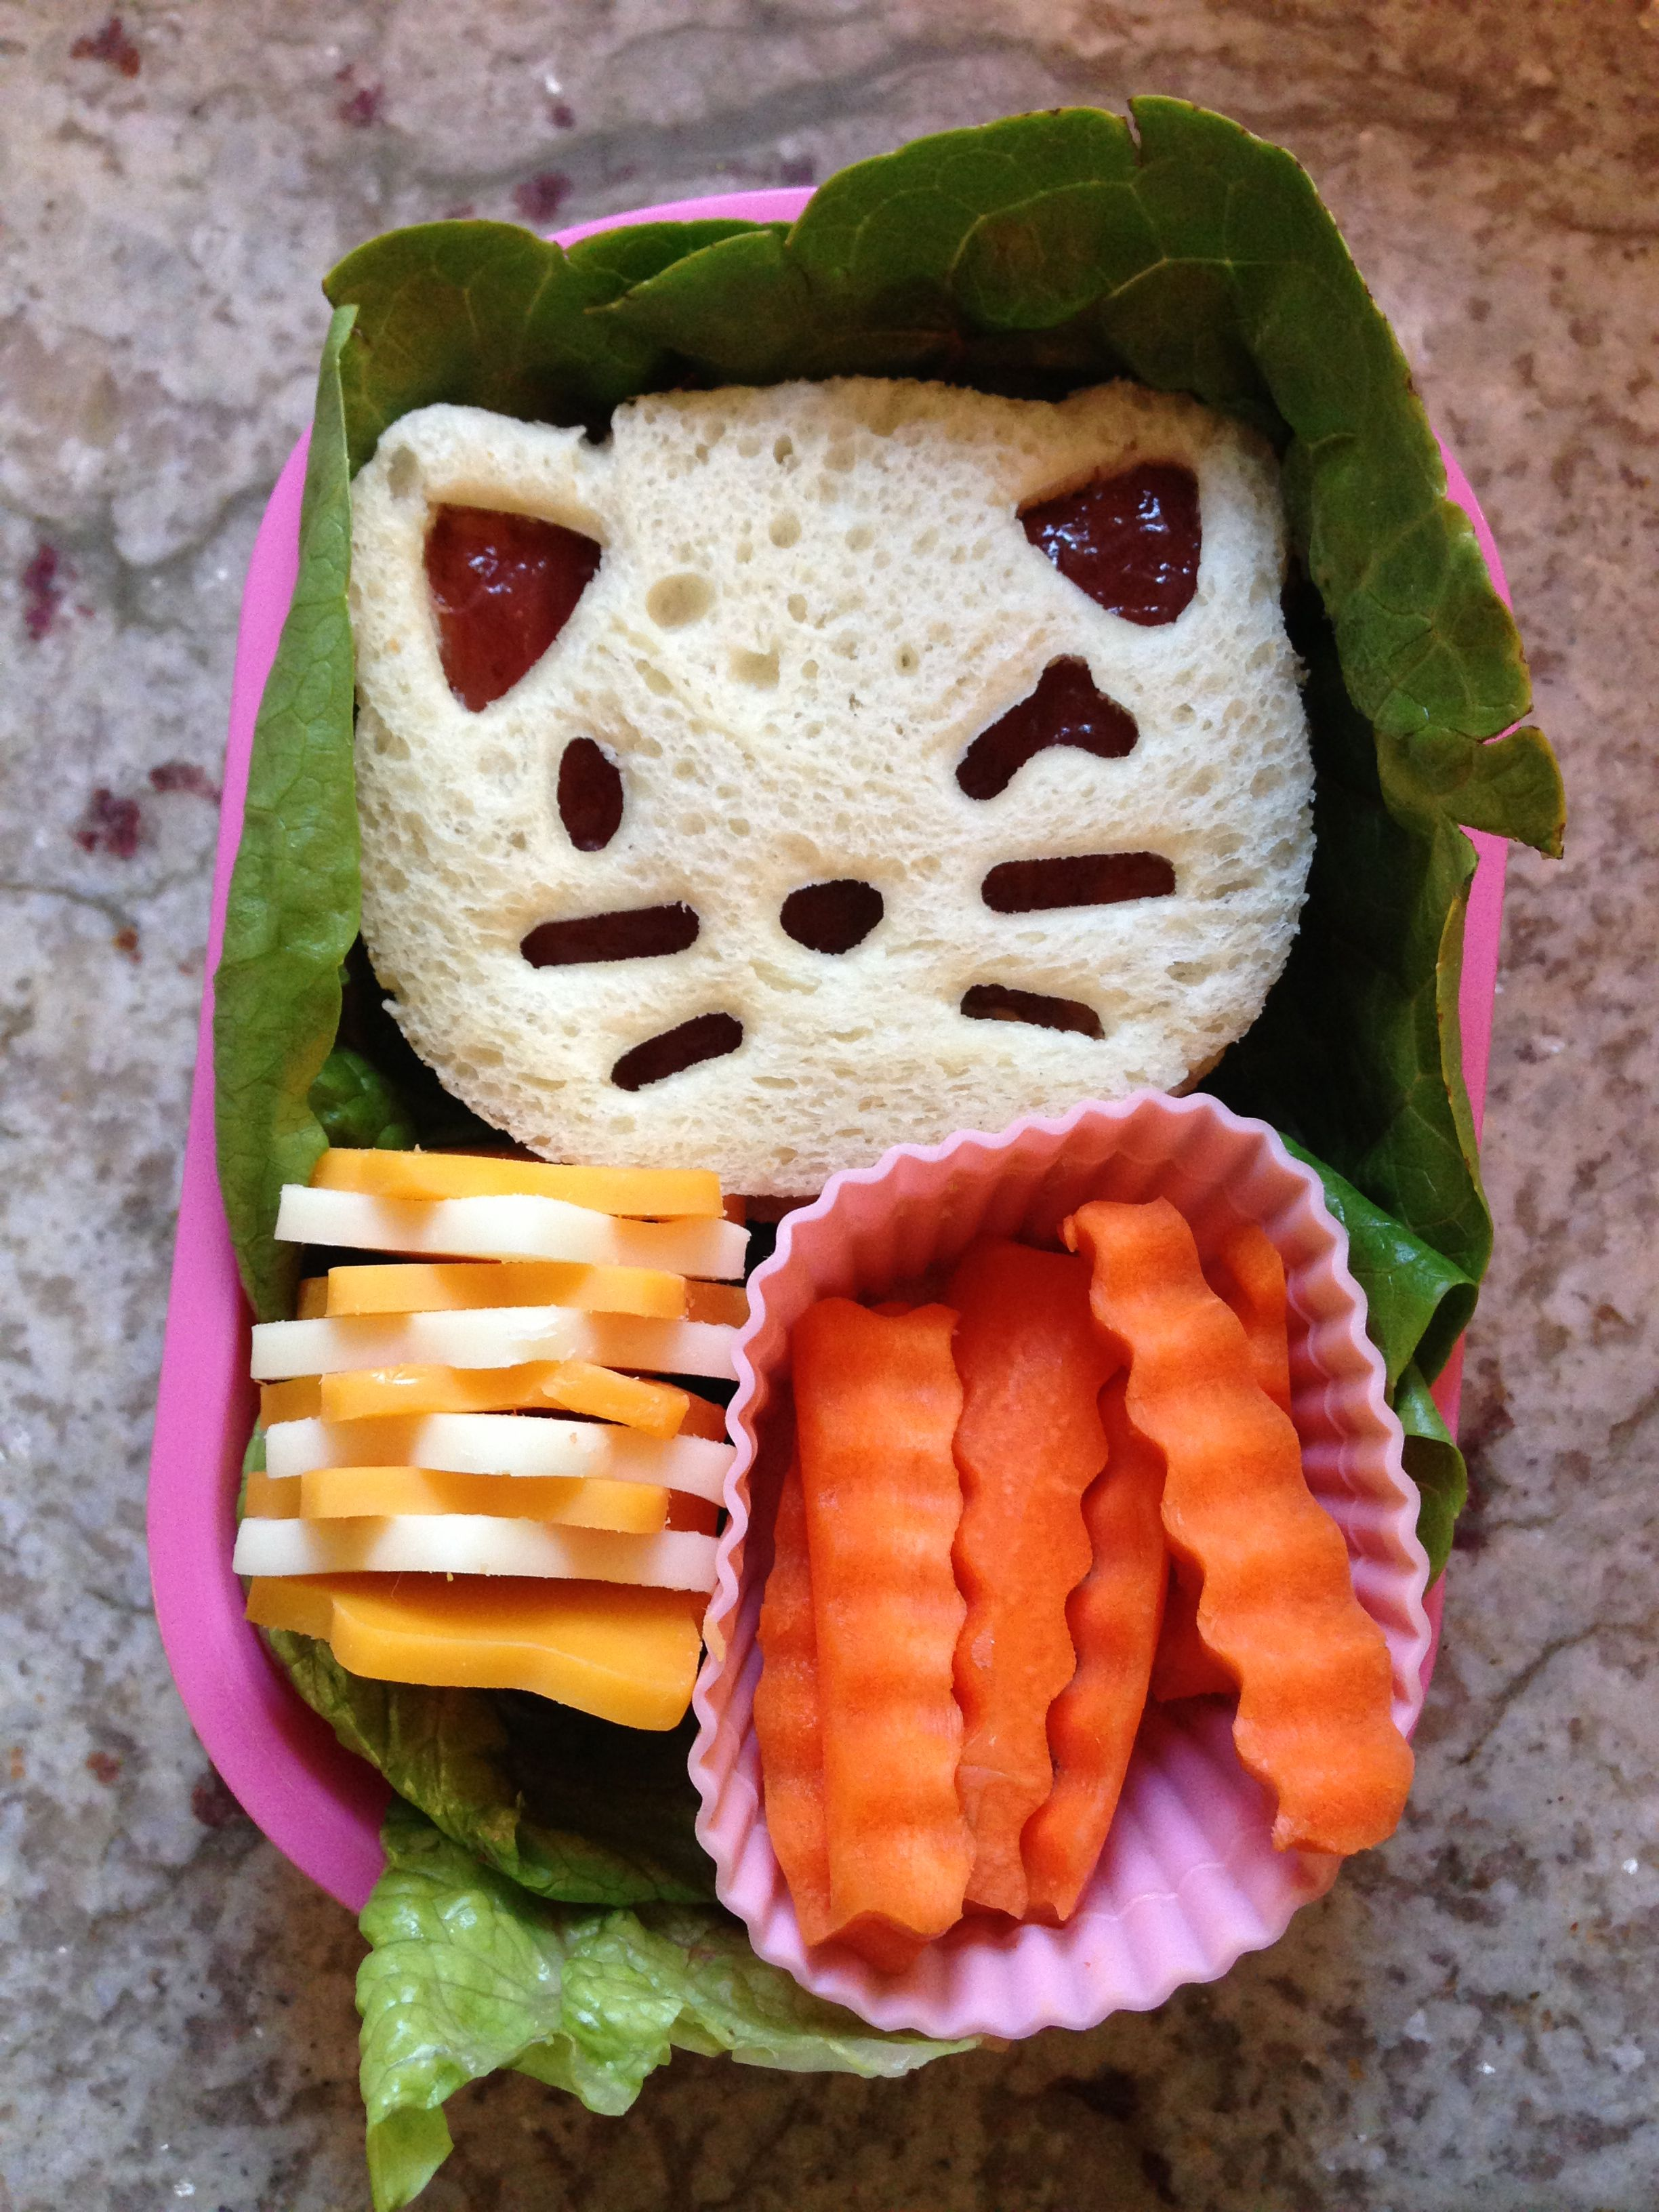 Kitty Peanut Butter Sandwich Cheese Star And Carrot Stick Bento Peanut Butter Sandwich Cheese Stars Carrot Sticks